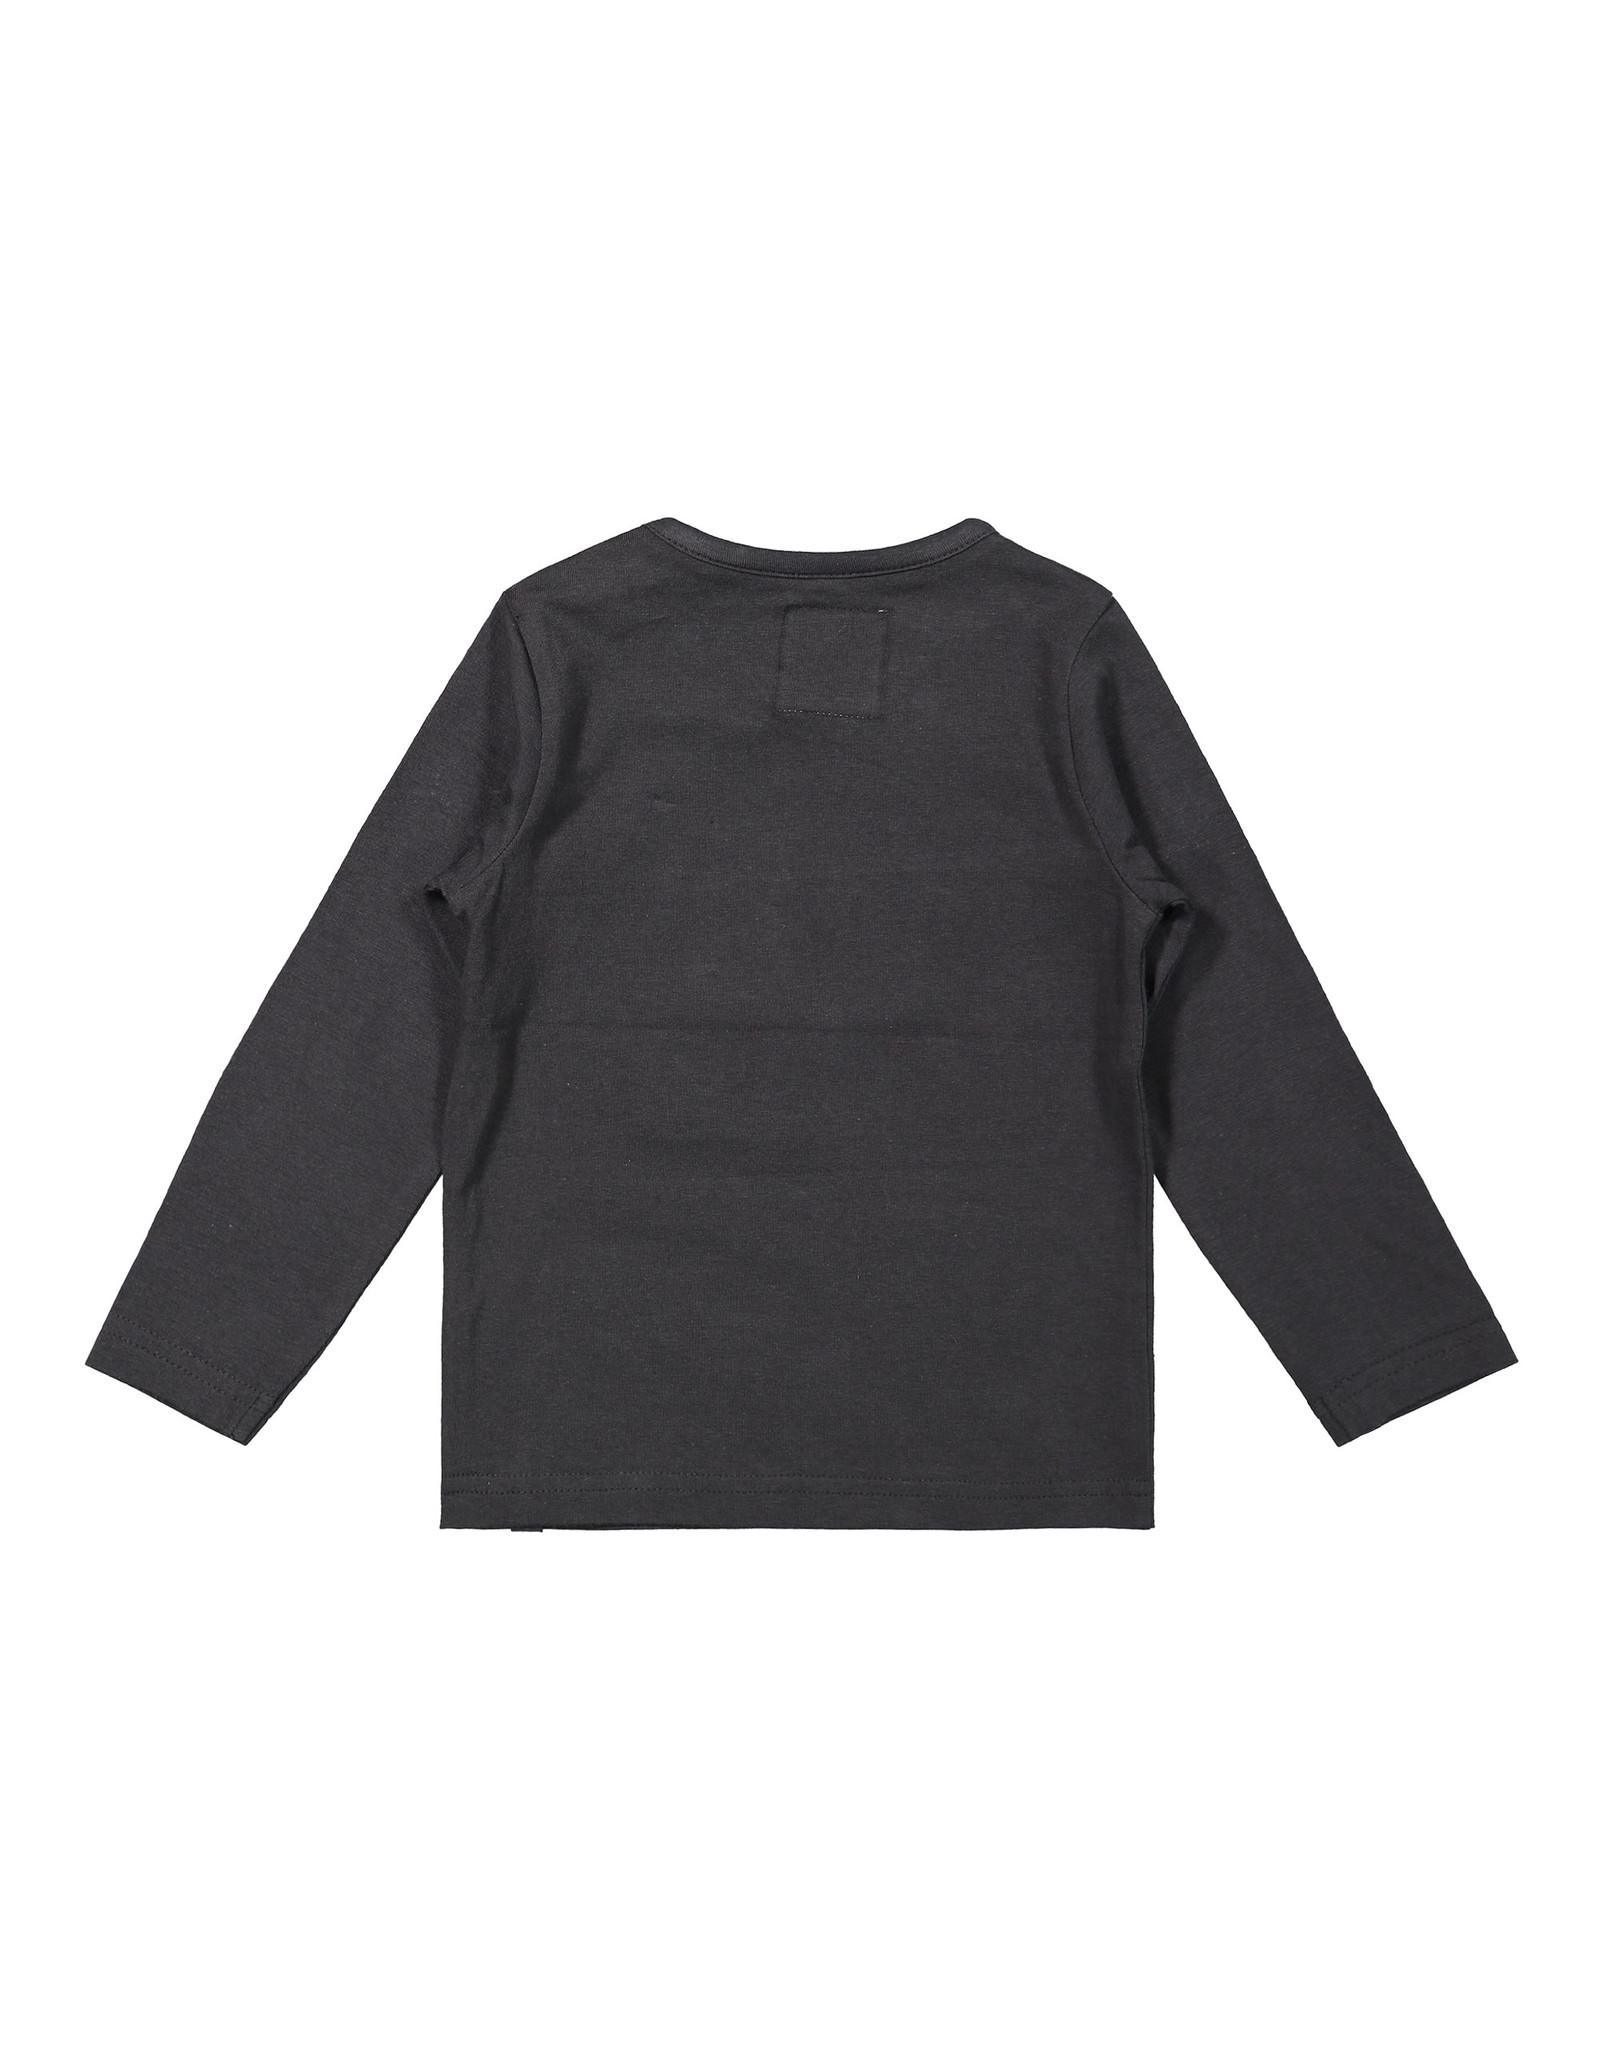 Koko Noko Koko Noko jongens shirt World Travellers Dark Grey